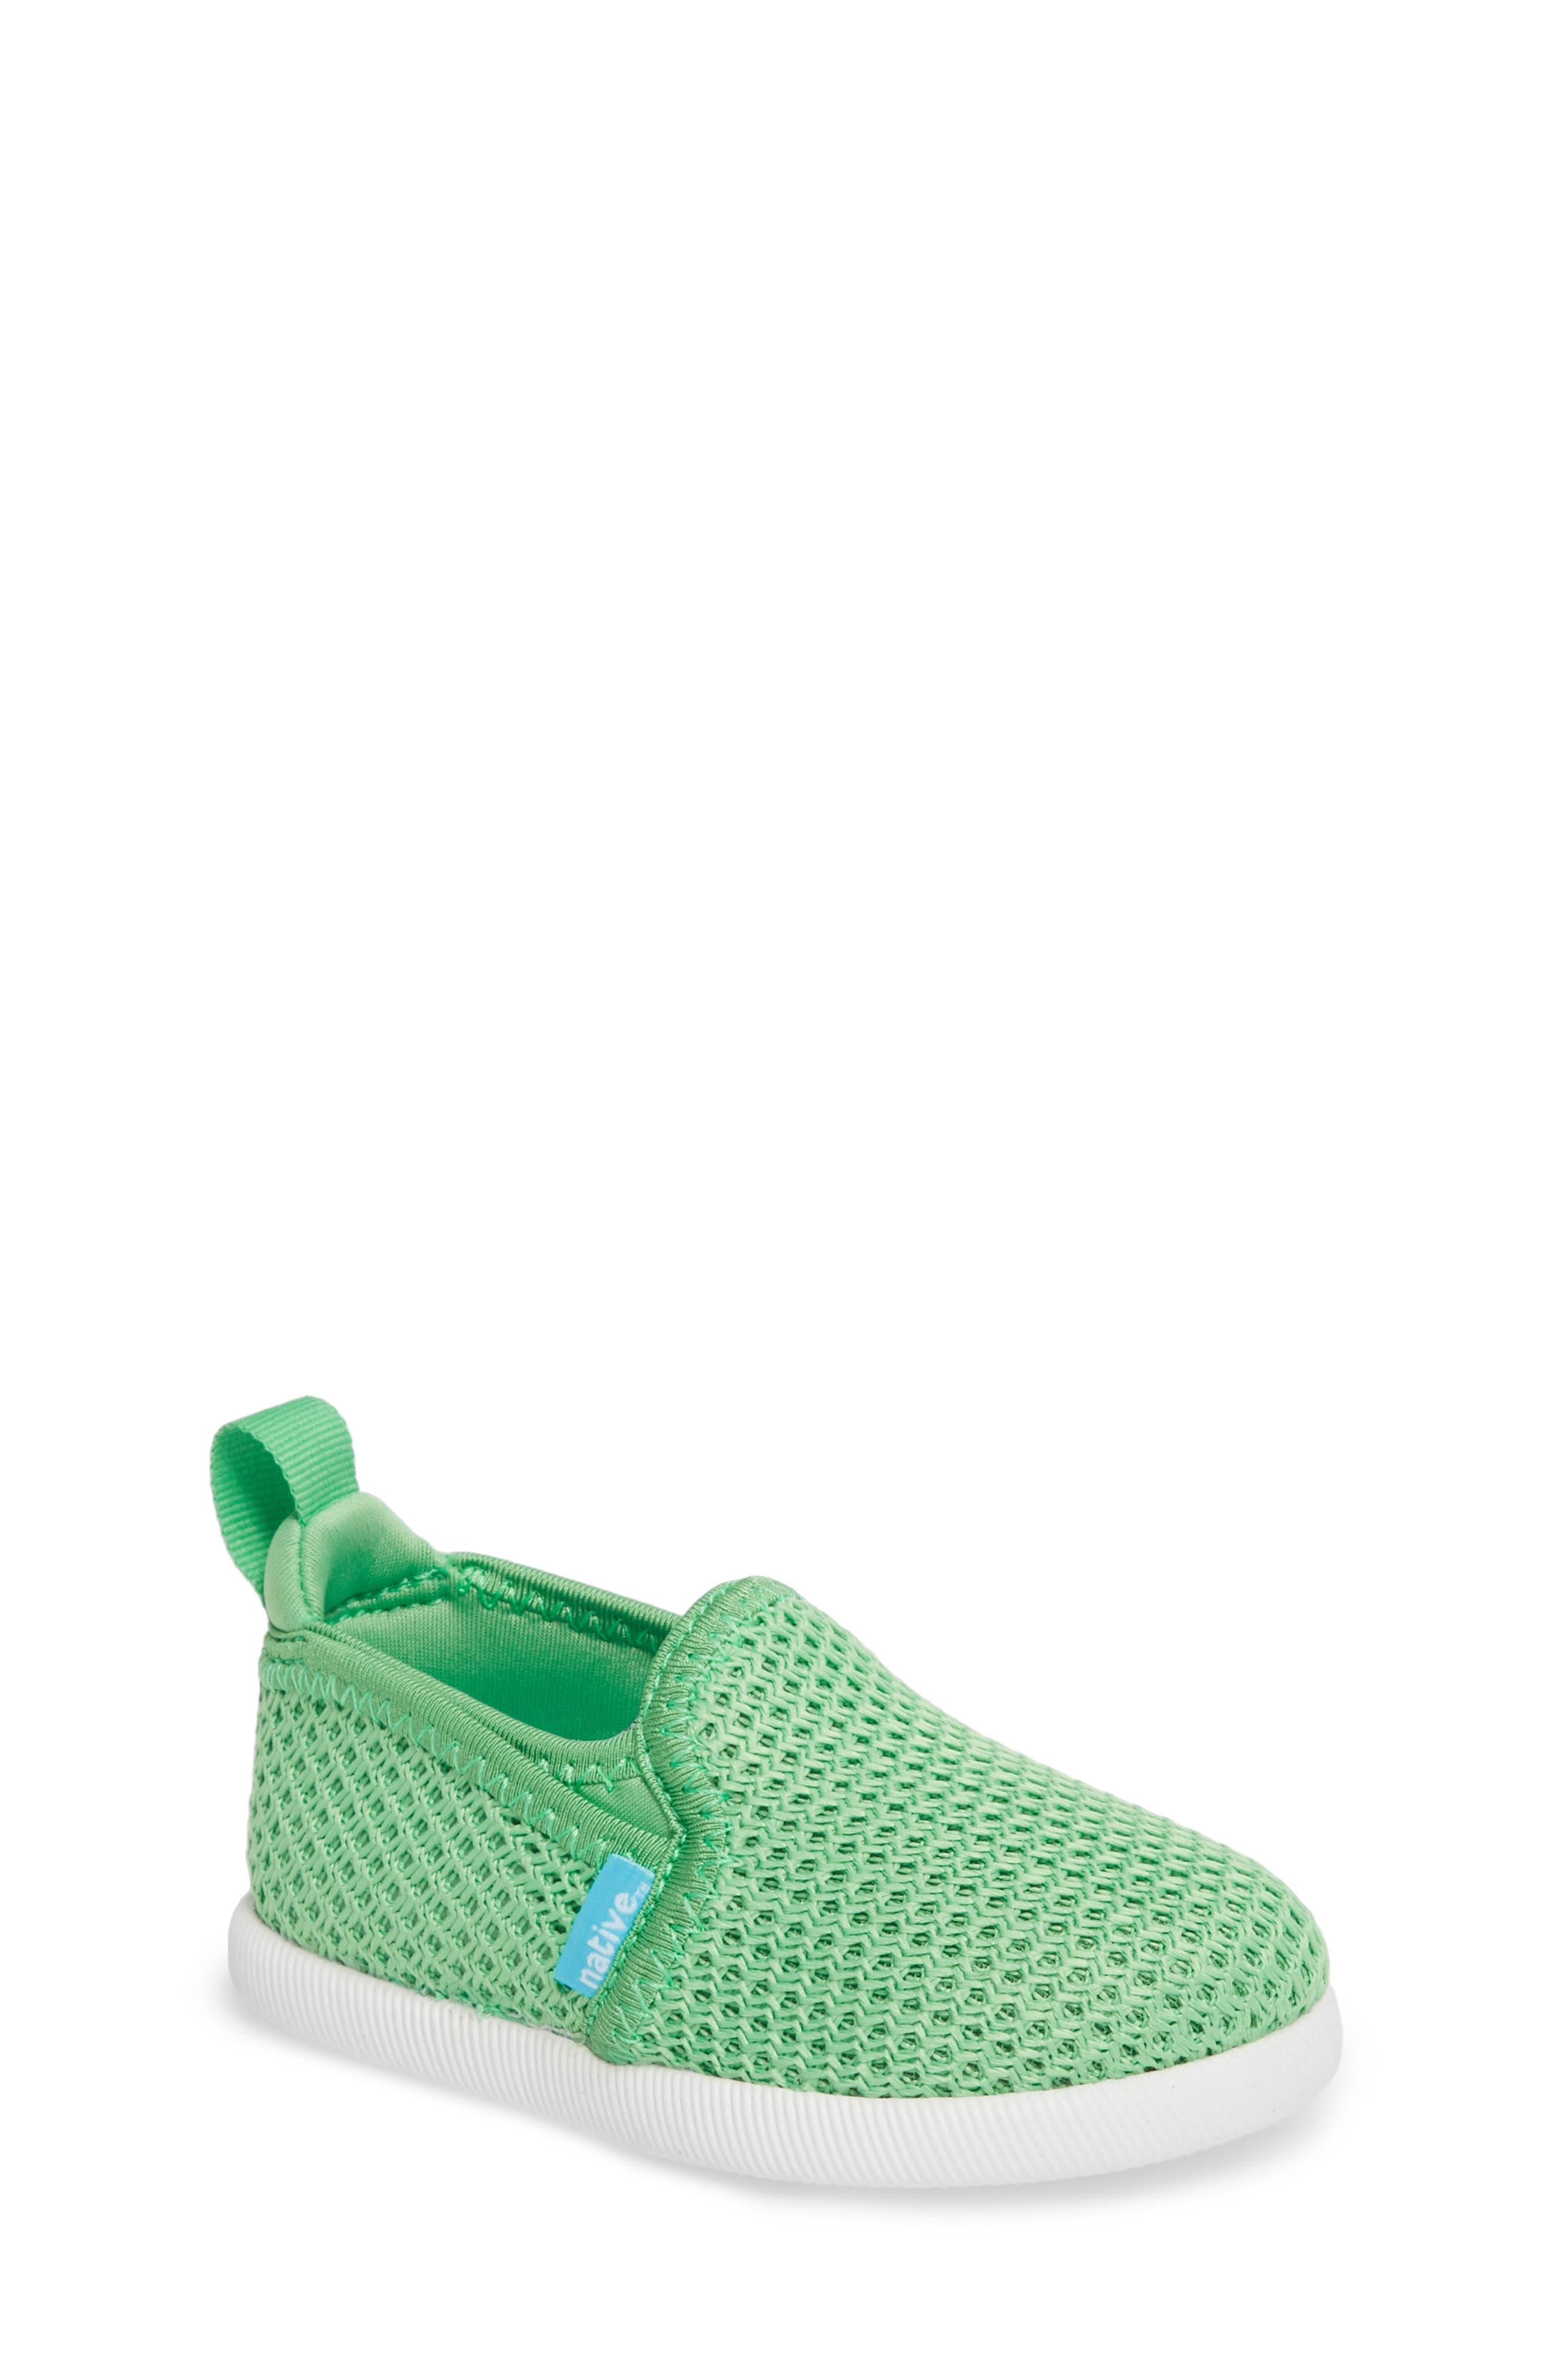 Alternate Image 1 Selected - Native Shoes Cruz Woven Slip-On (Walker, Toddler & Little Kid)